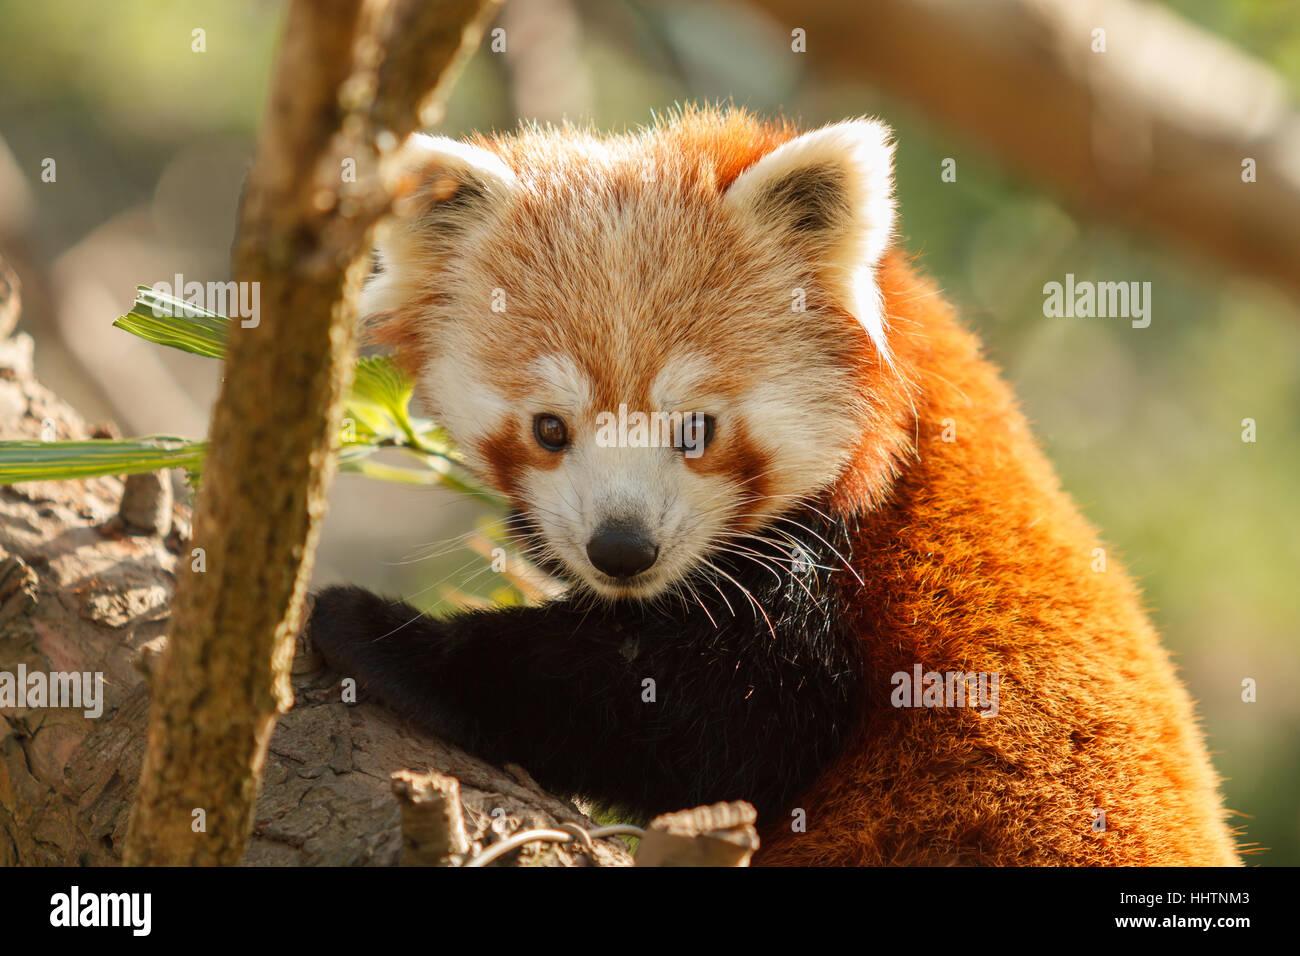 Chinese or Himalayan Red Panda latin name Ailurus fulgens, also known as the lesser panda or red bearcat indigenous - Stock Image